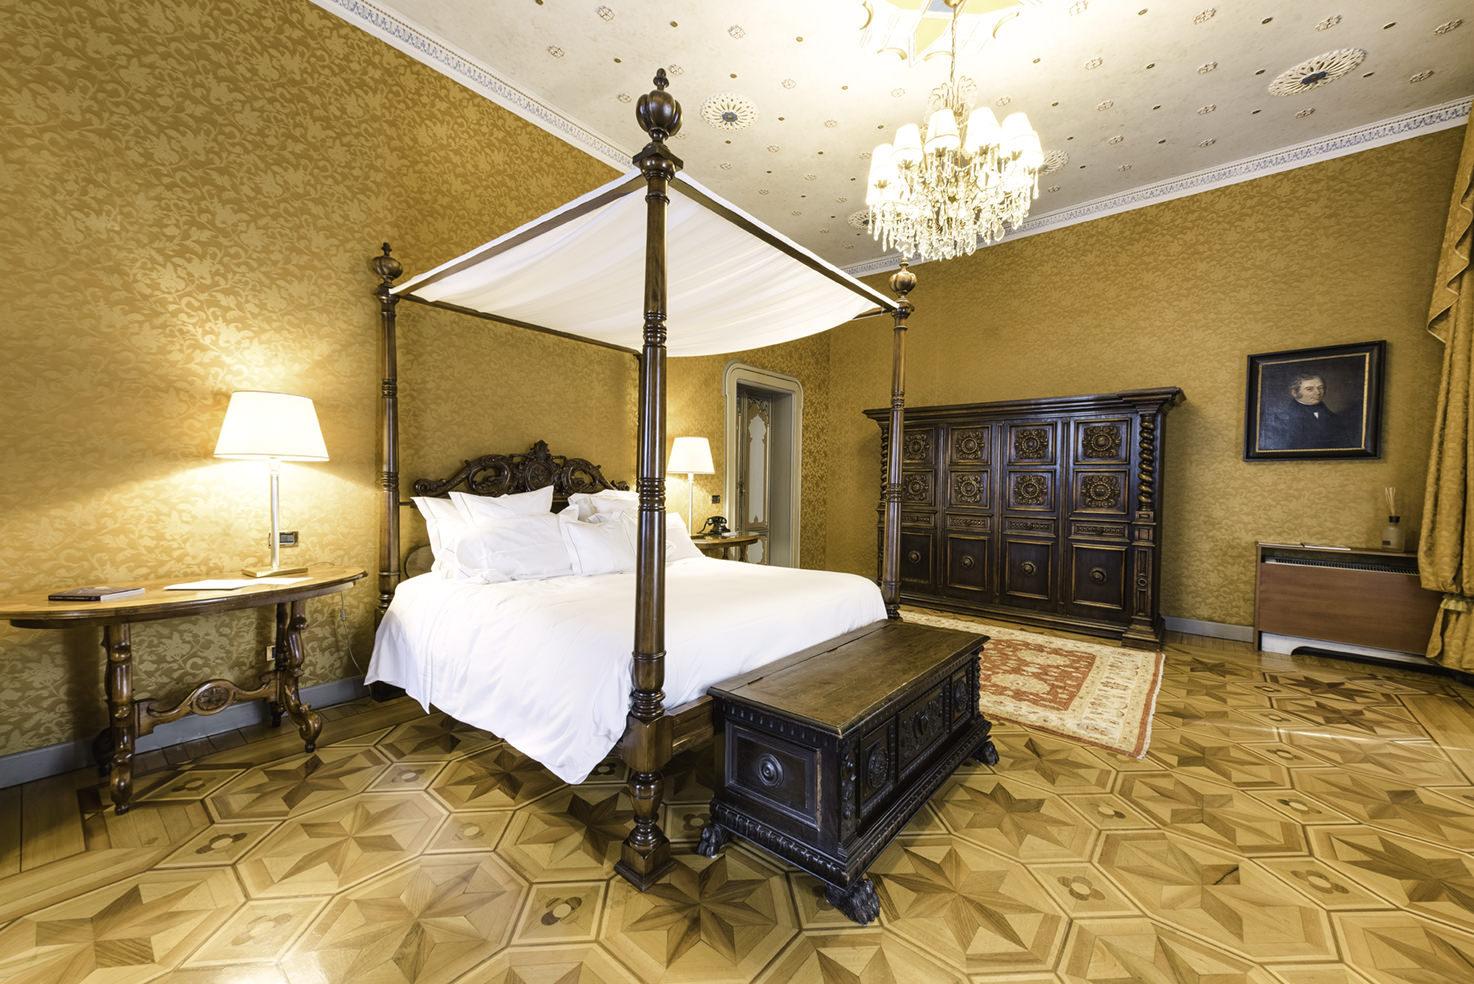 Accommodation at Villa Crespi